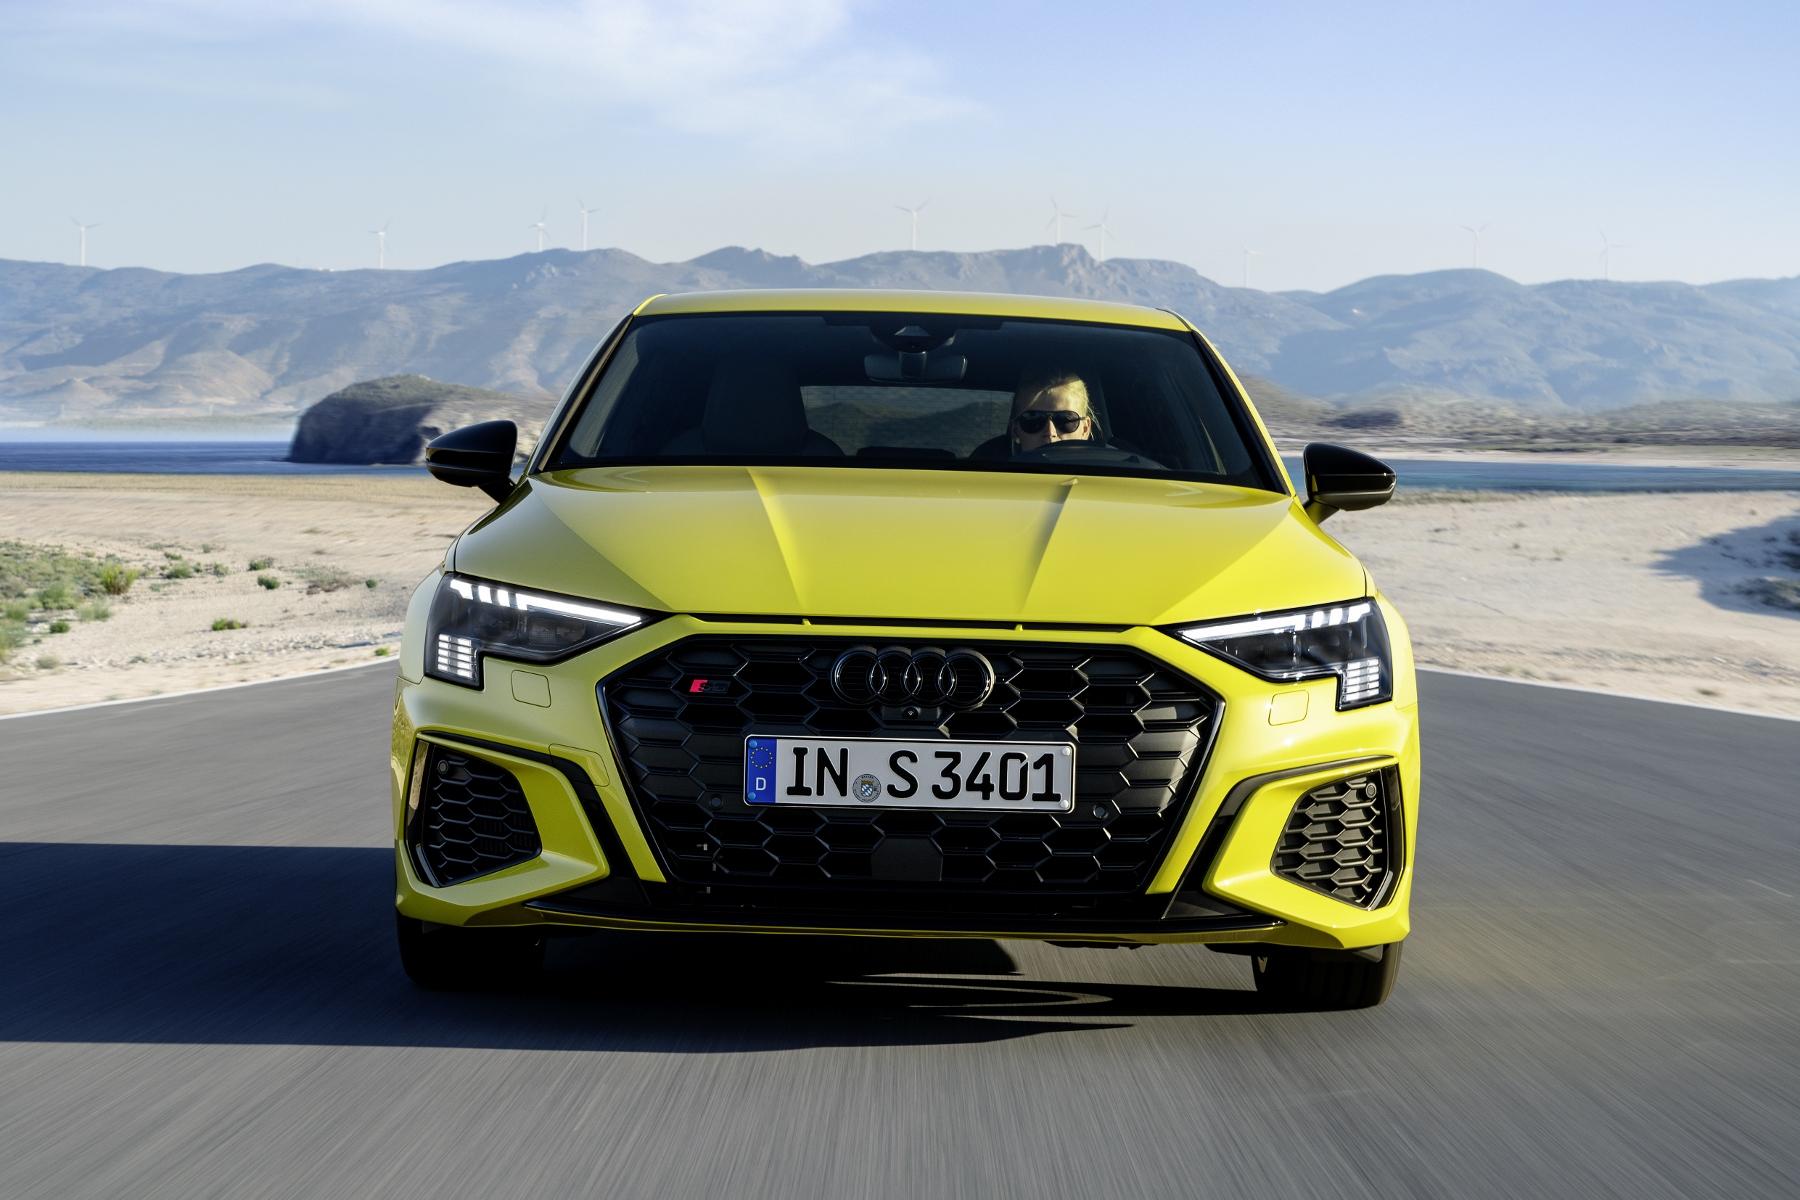 Audi ukázalo modely S3 Sedan a Sportback. Prezradilo aj nemeckú cenu 6hqAXQZg5e a204407large-1800x12